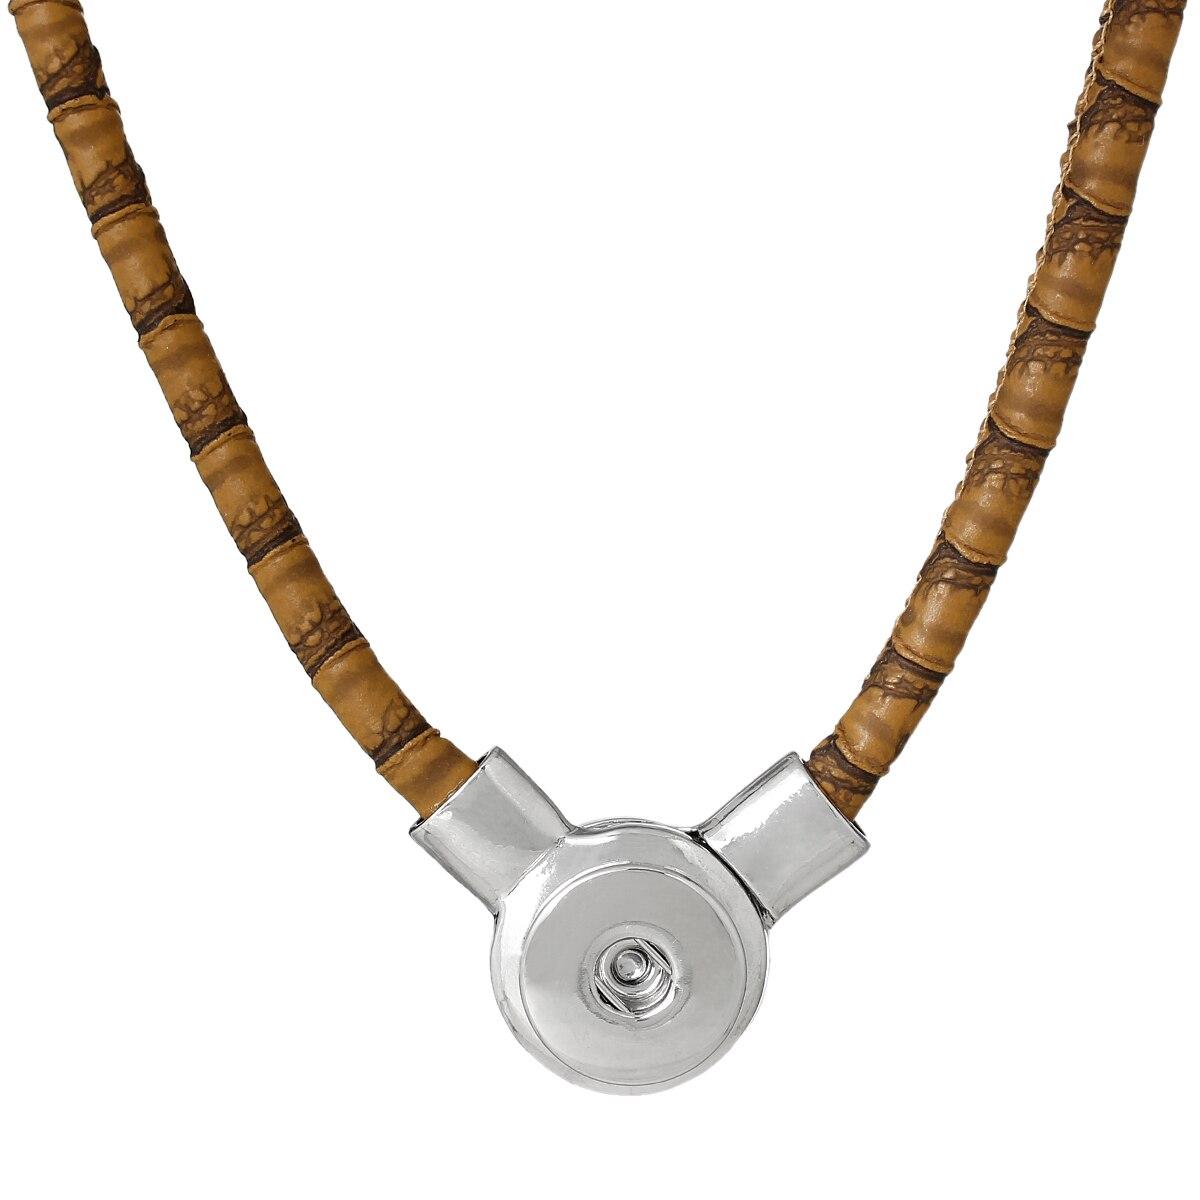 "8SEASONS PU Fashion Snap Jewelry Necklace Brown Silver Tone 50cm x2.3cm(<font><b>19</b></font> <font><b>5</b></font>/<font><b>8</b></font>"" <font><b>x</b></font> 7/<font><b>8</b></font>""),Snap Charm Hole Size: 6mm,1 PC"